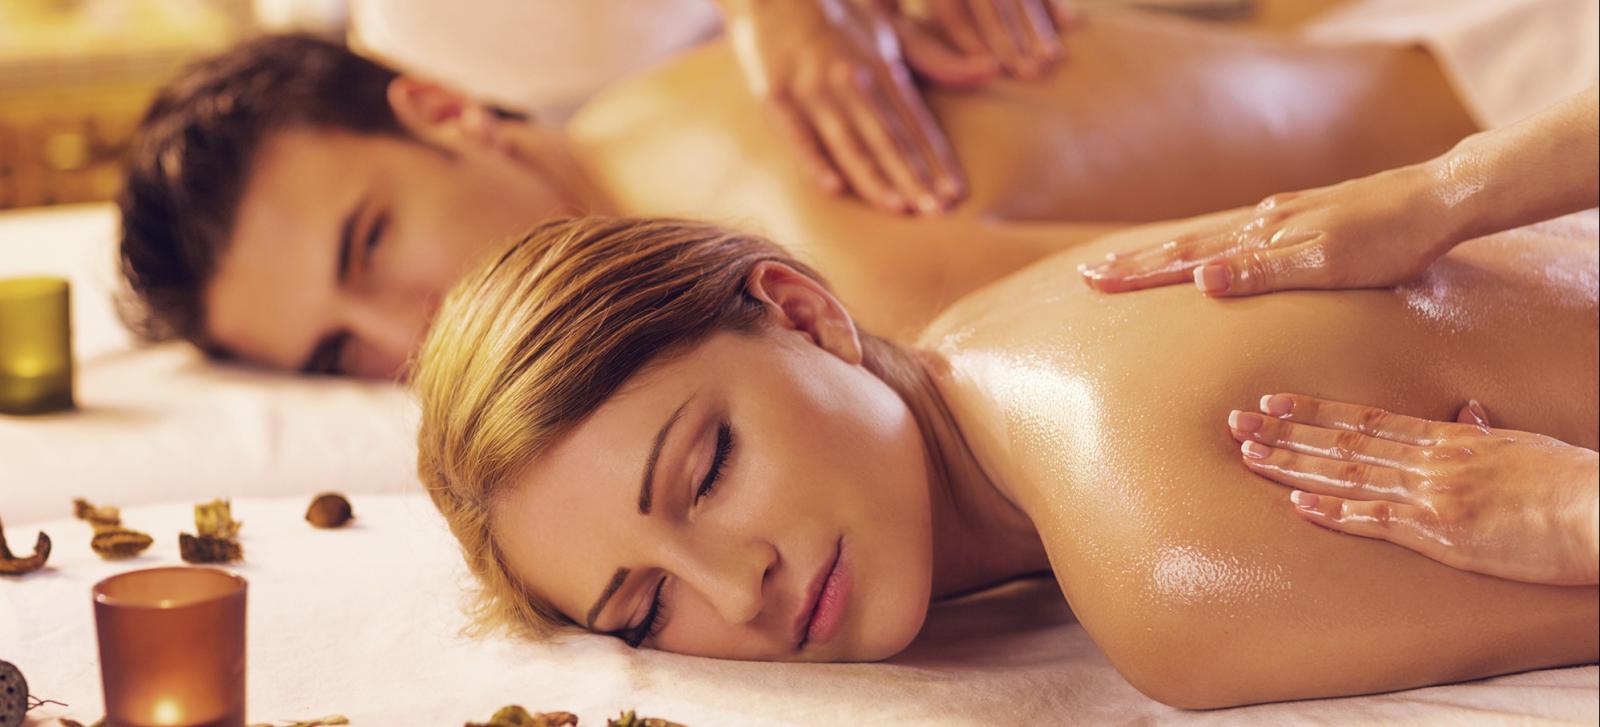 erotisk massage uppsala massage gamla stan